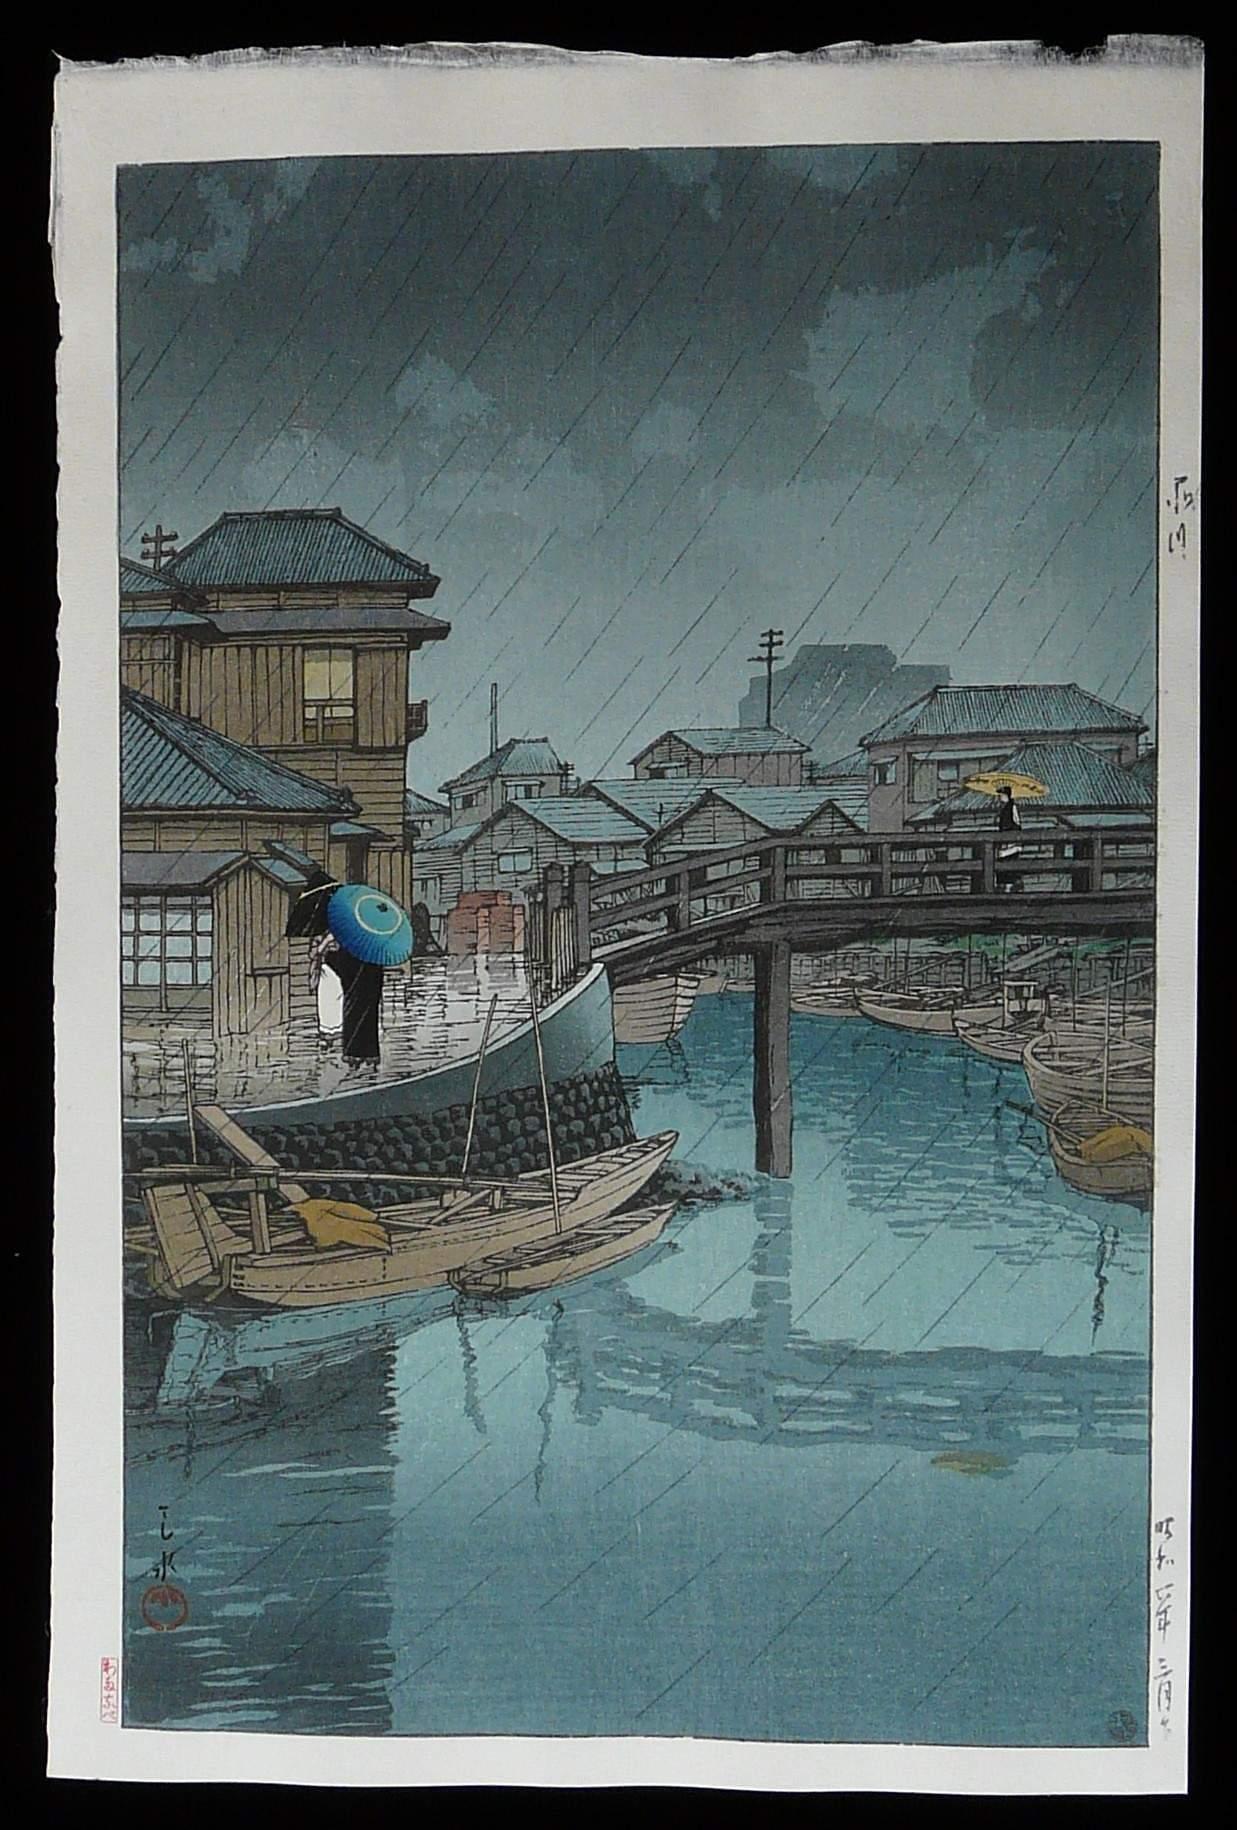 KAWASE HASUI: #P1682 RAINY SEASON AT RYOSHIMACHI, SHINAGAWA